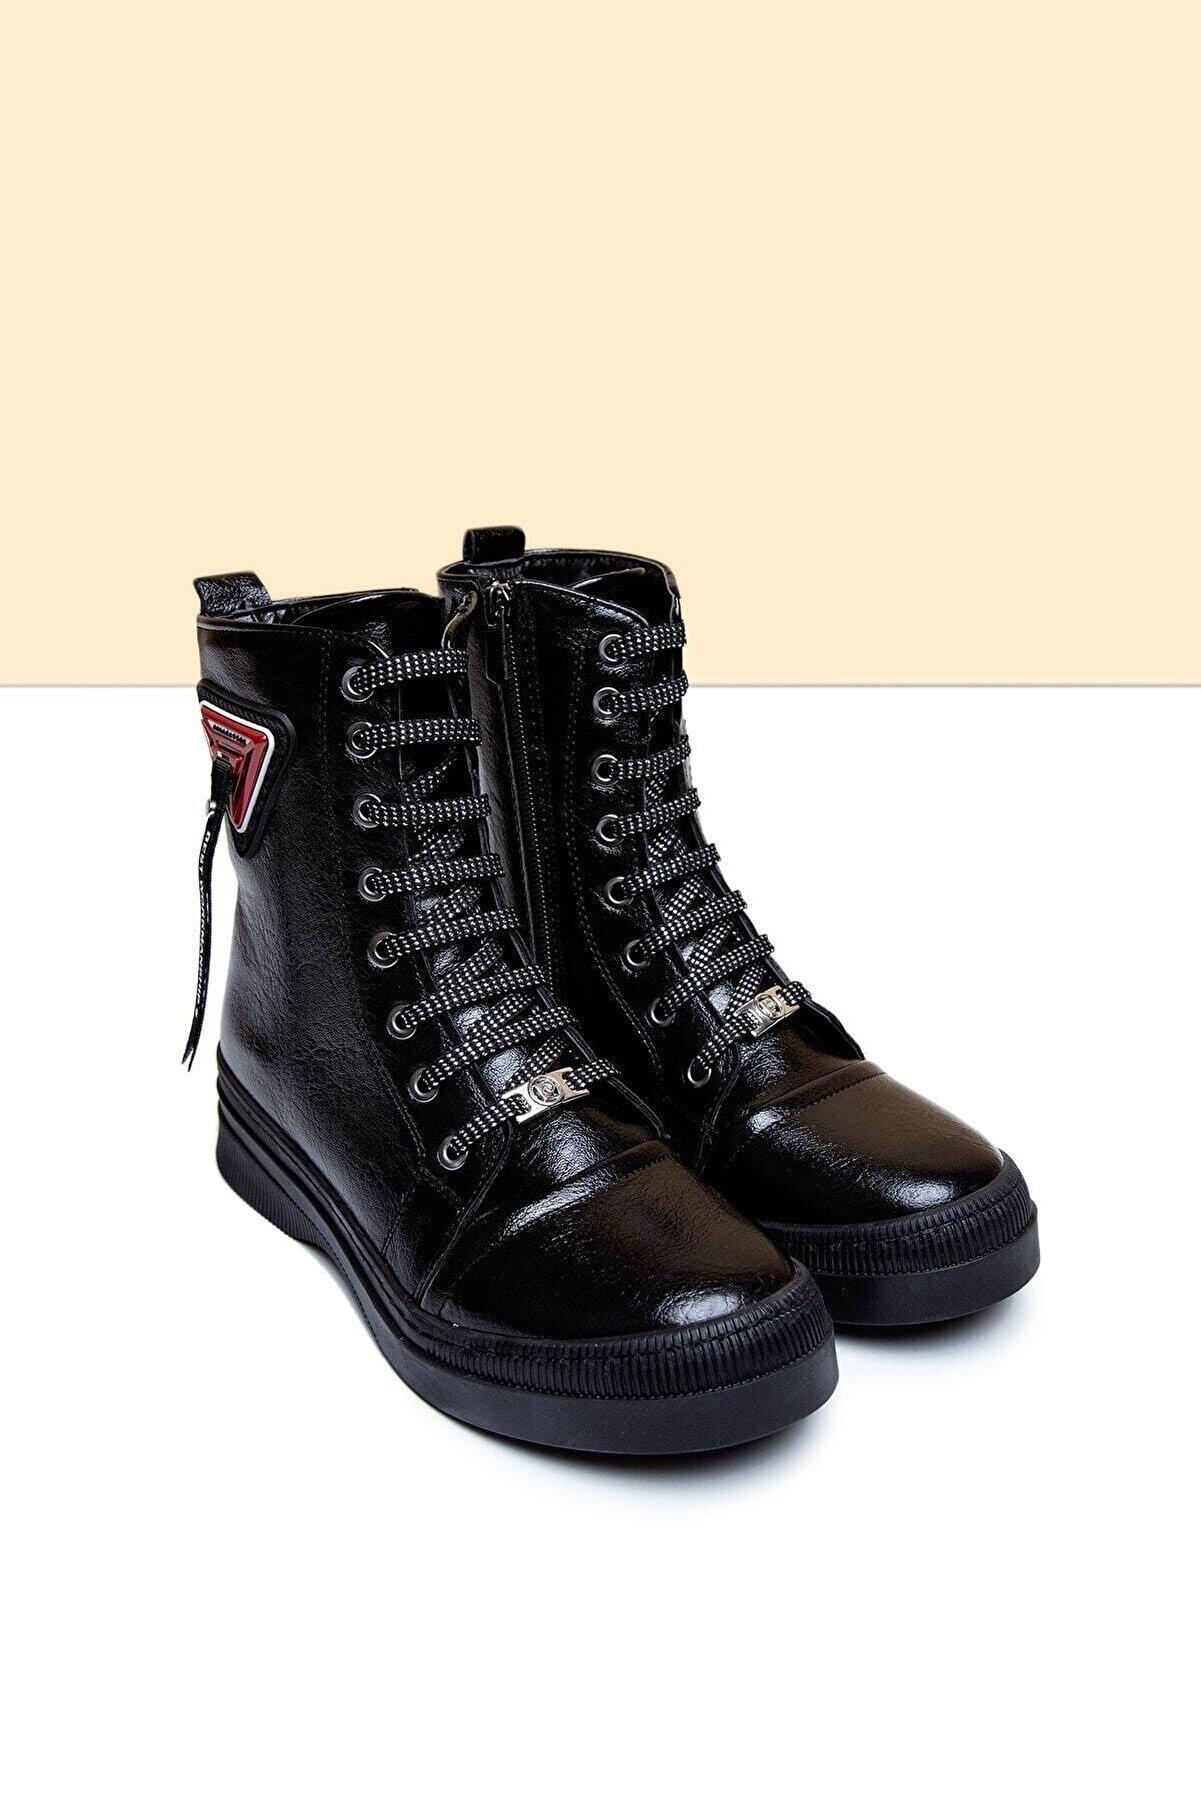 Pierre Cardin Pc-50727 - 3165-01-siyah